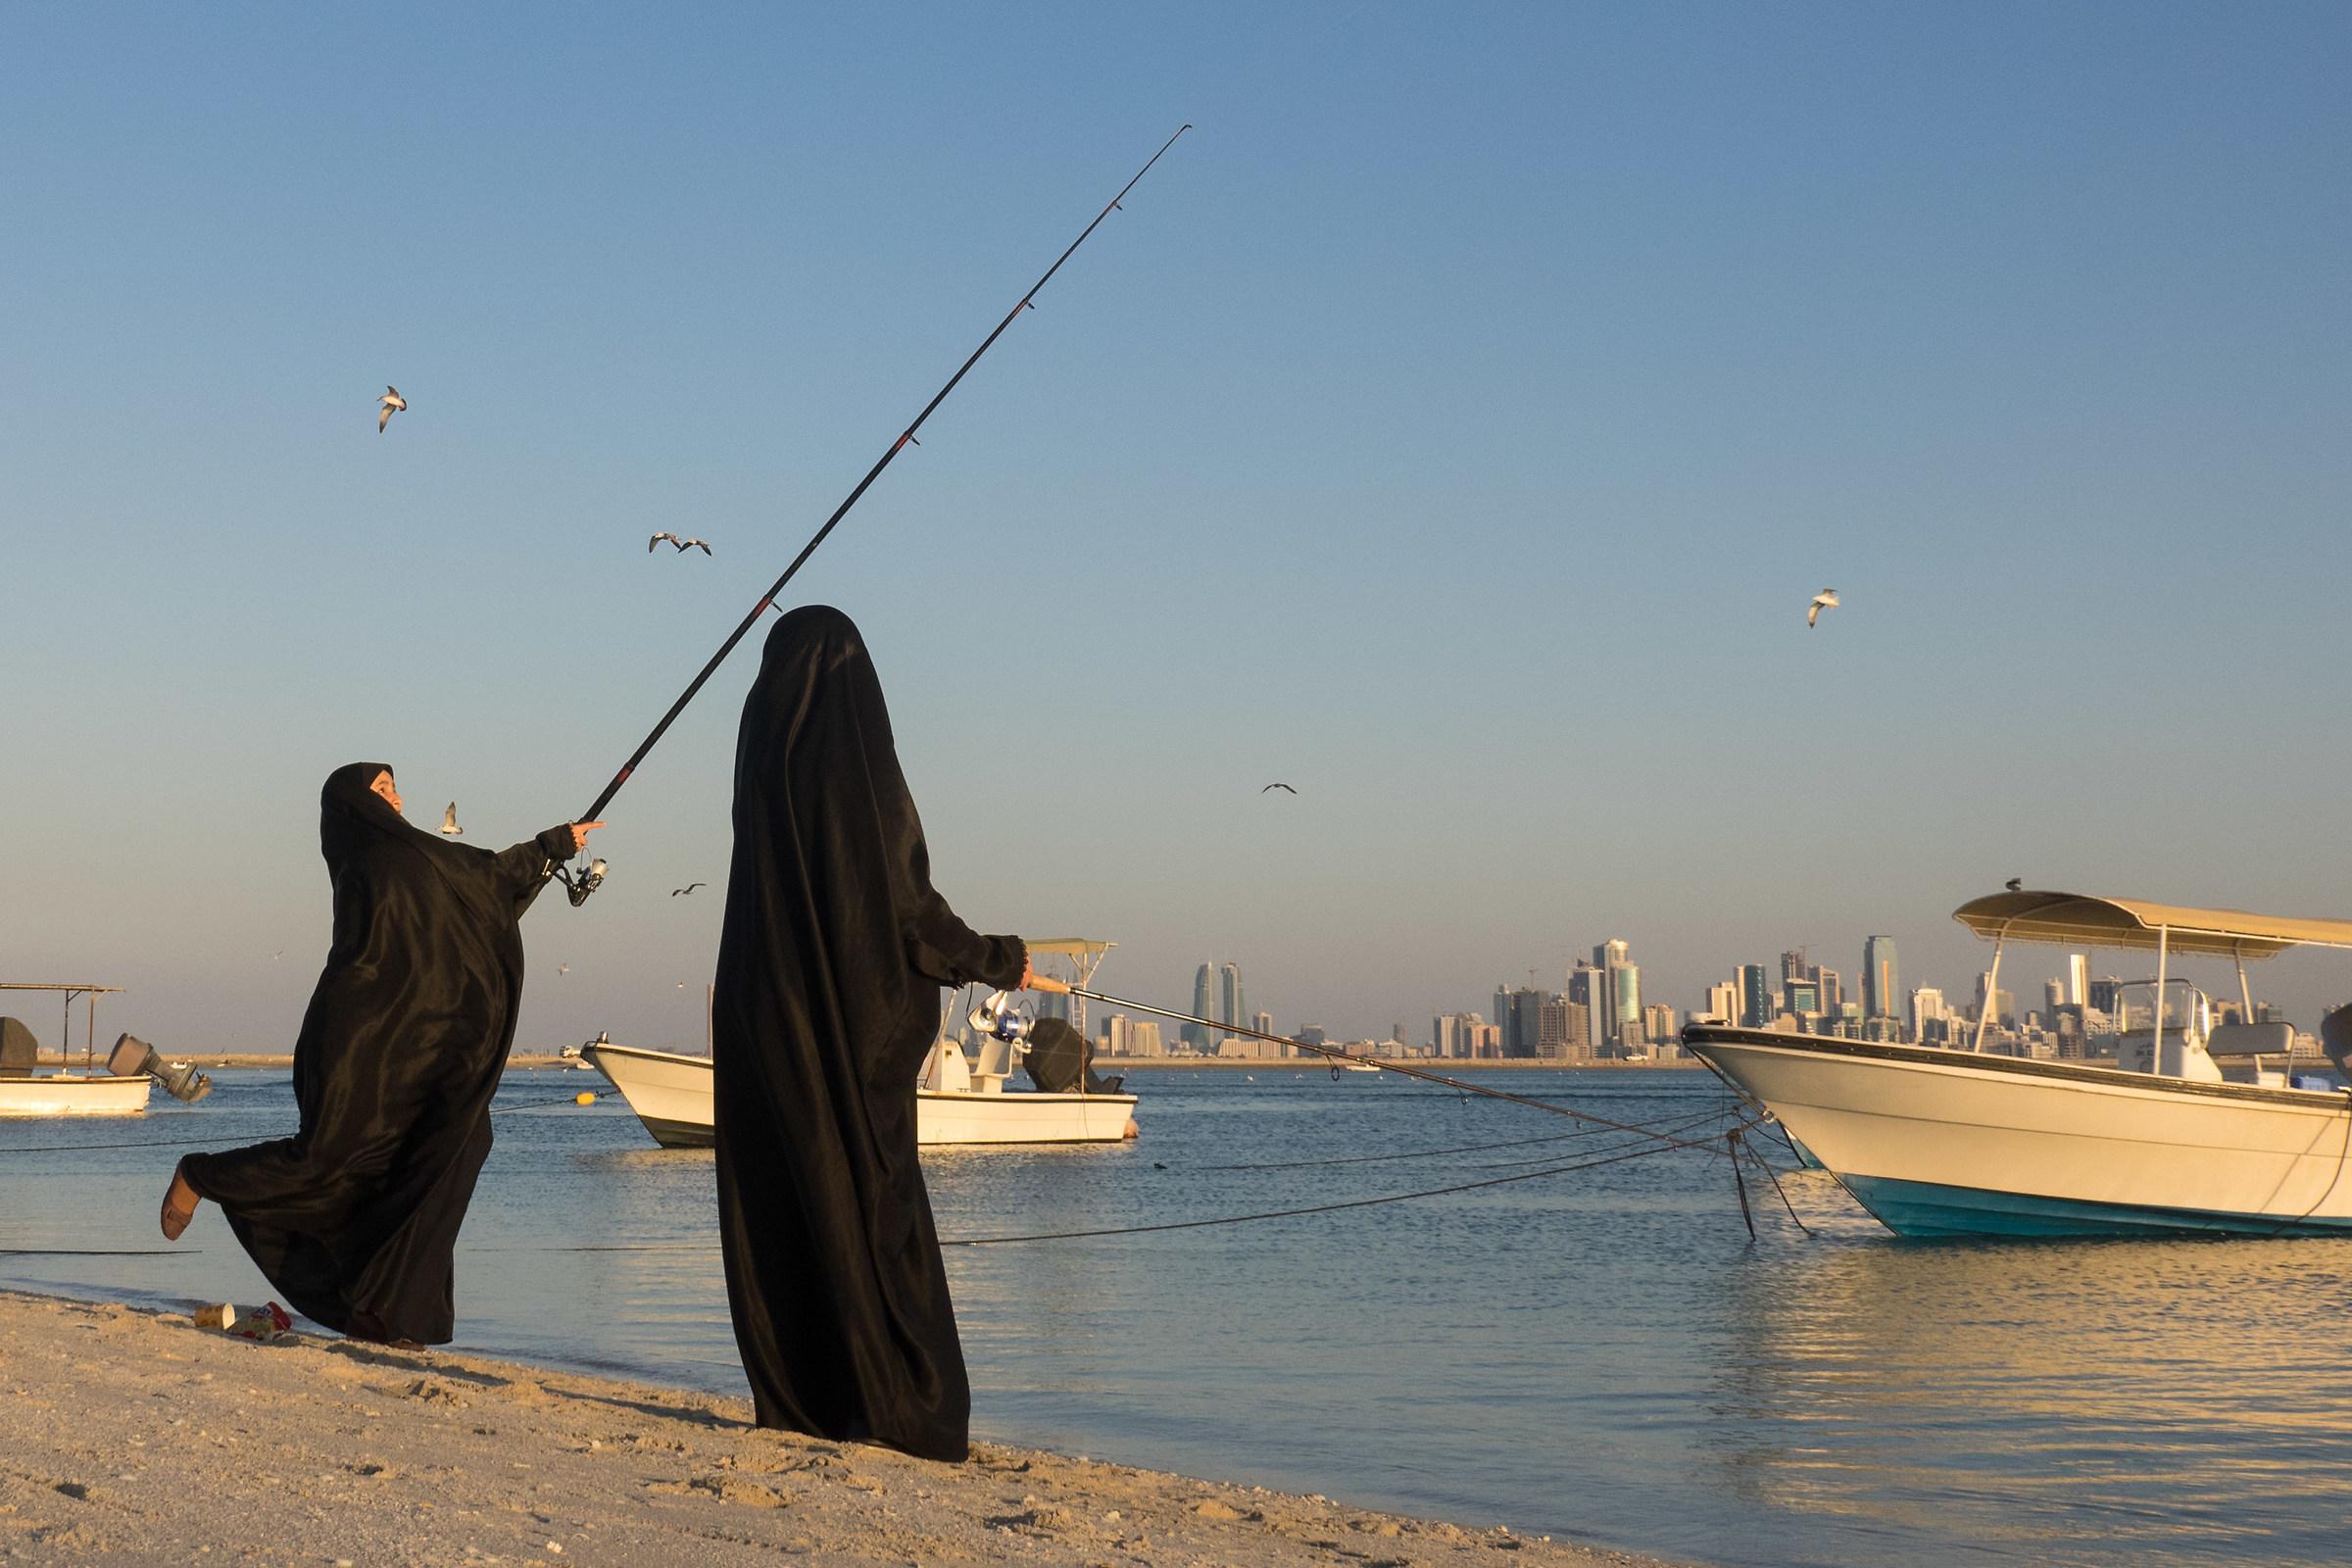 Fishing allowed...